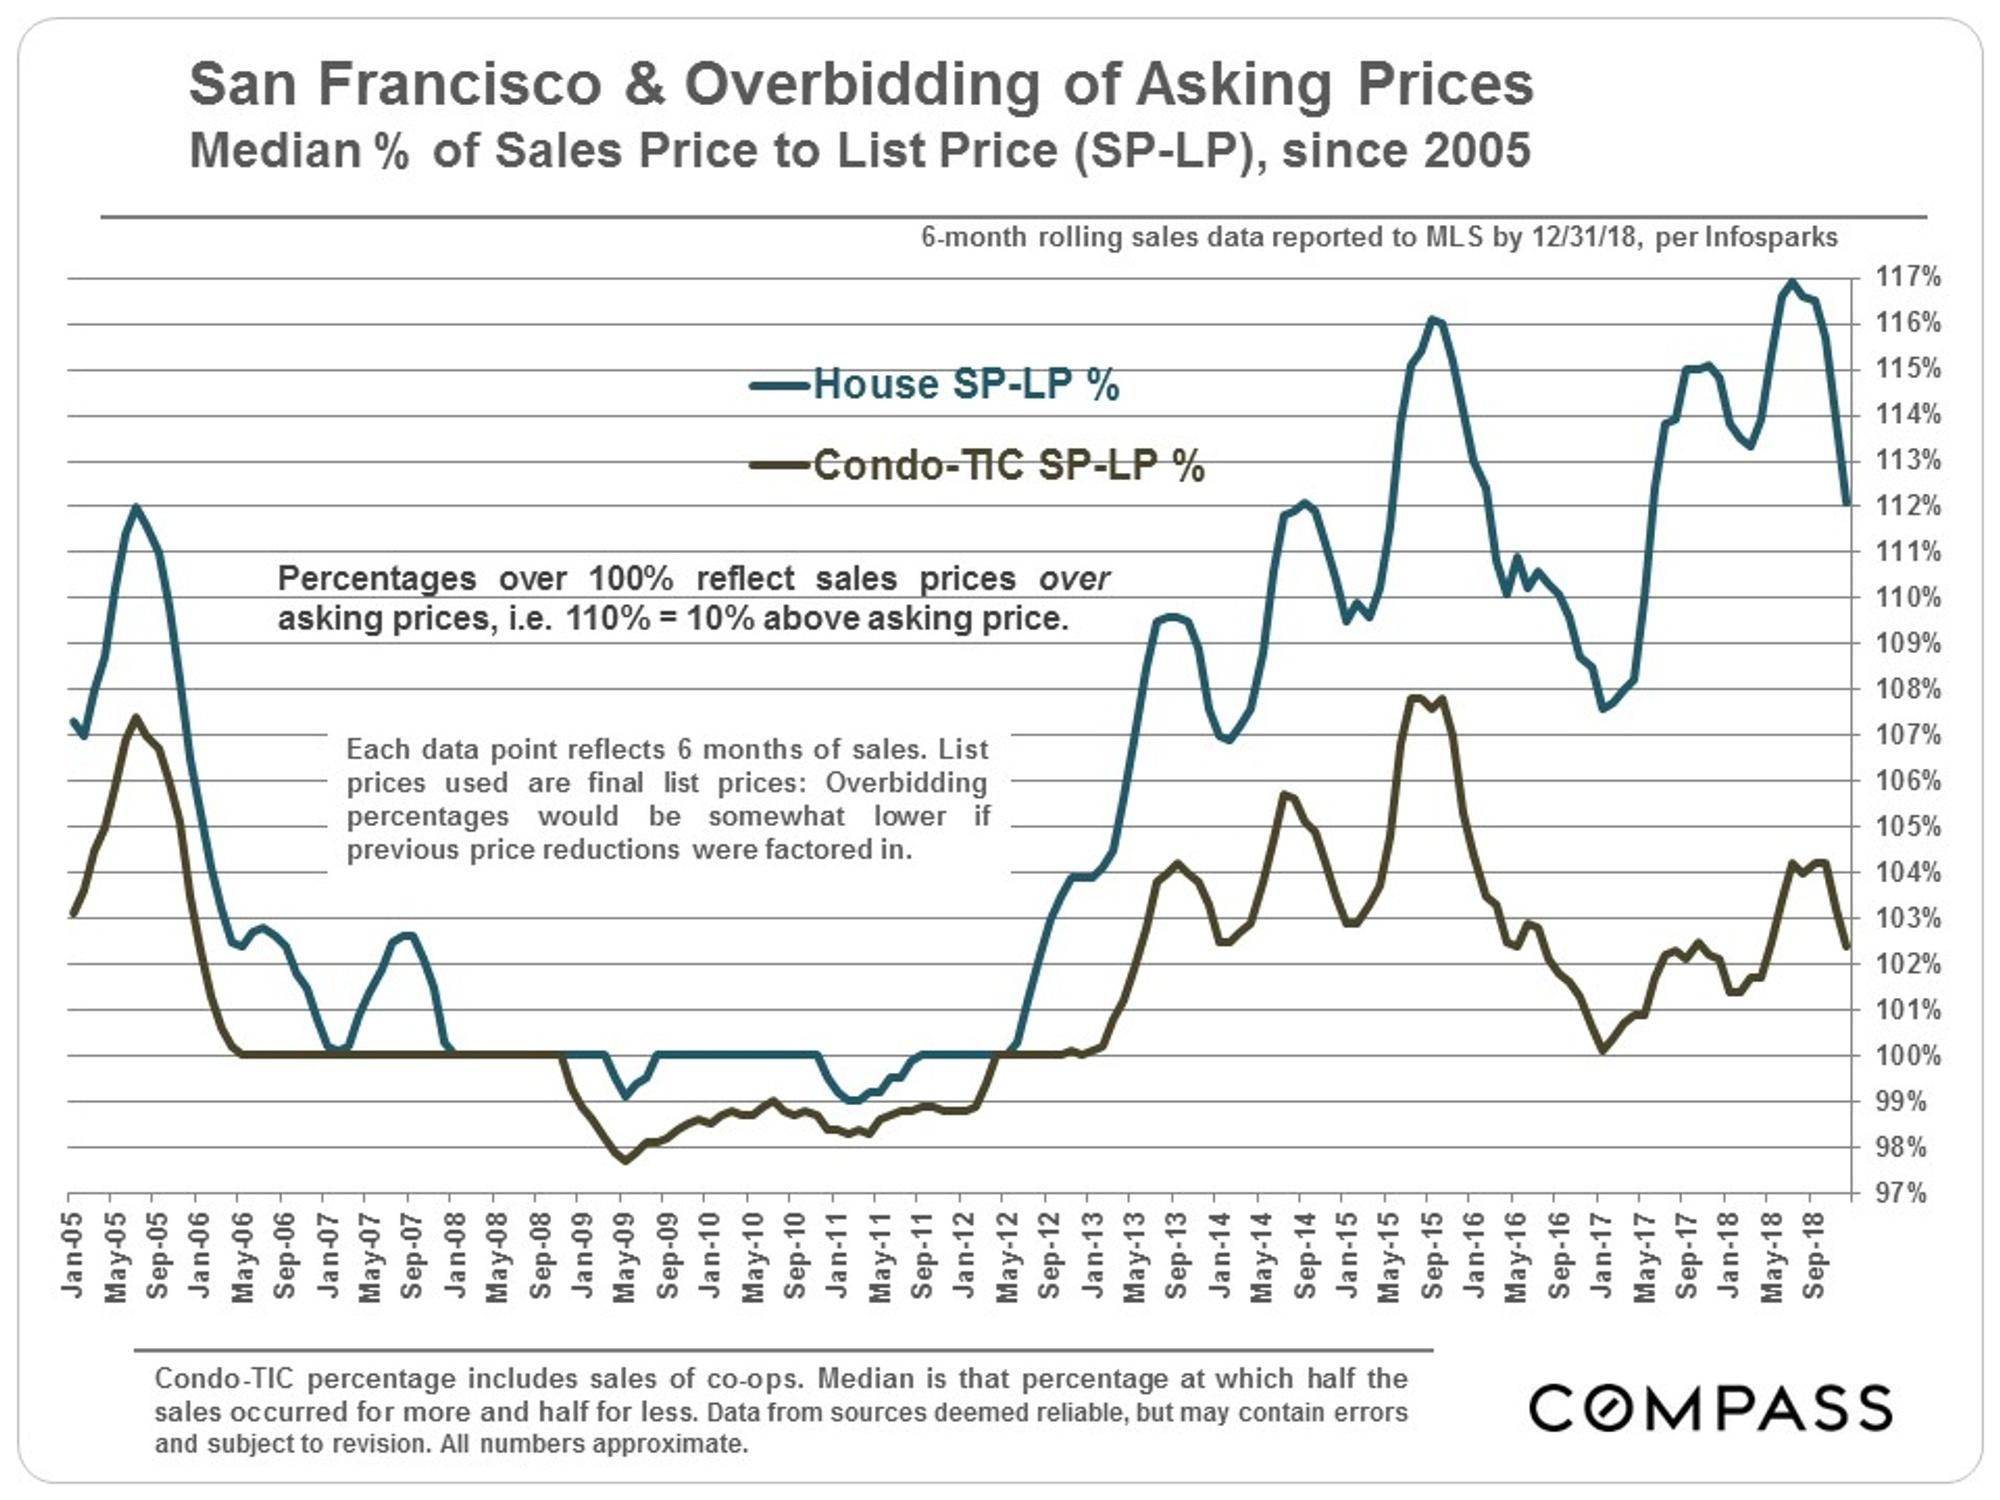 Looking Back on 2018 San Francisco Real Estate - HarukoSF com